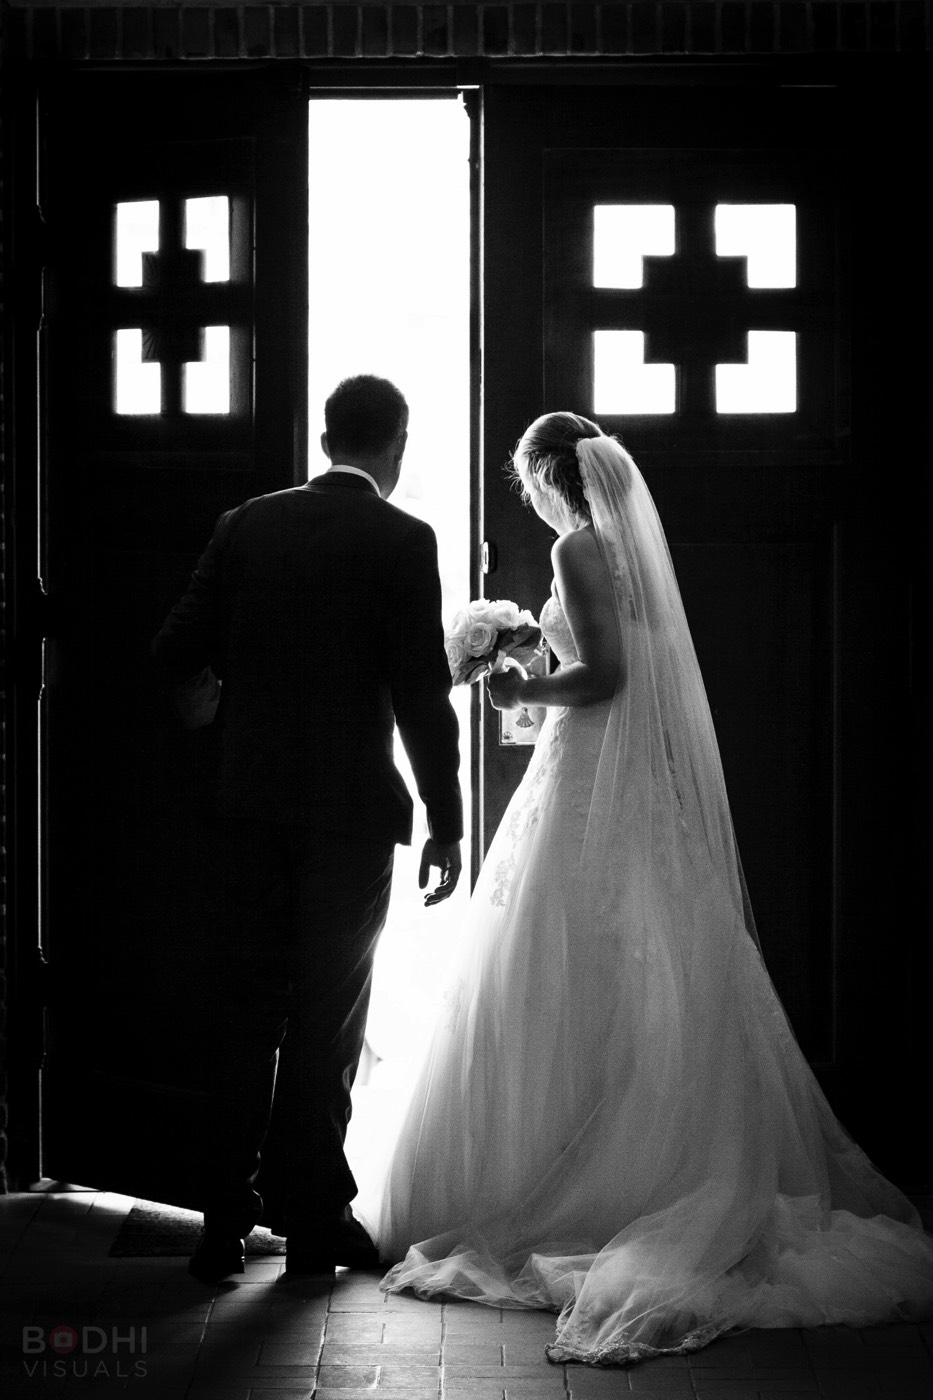 Bodhi-Visuals-Bryllupsbilleder-reference-03-1400pxl